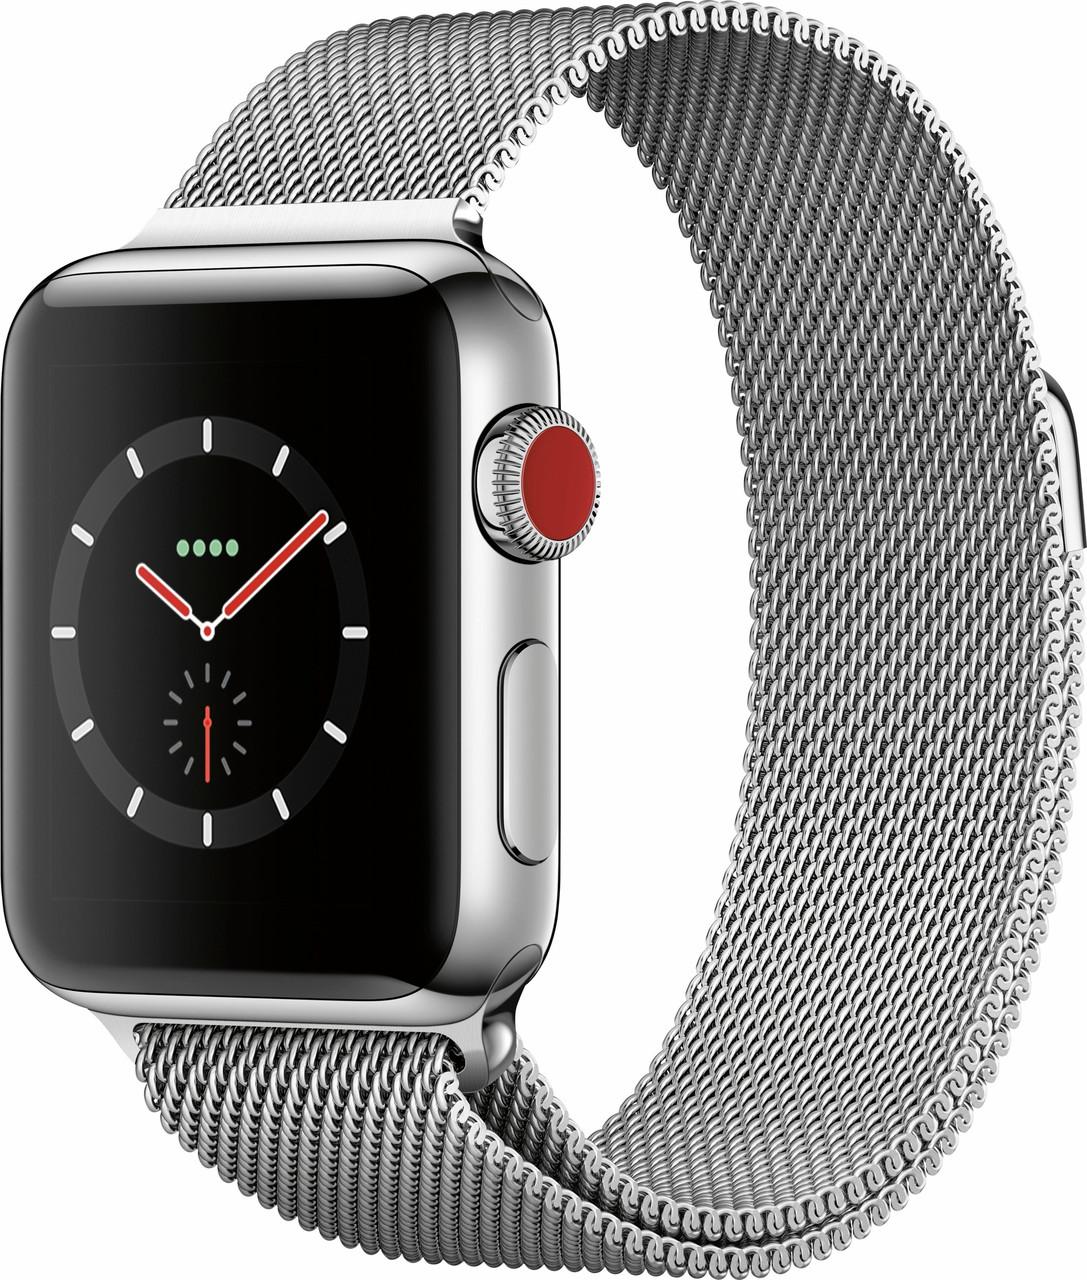 Apple Watch Series 3 GPS + Cellular 42mm Stainless Steel with Milanese Loop (MR1J2)